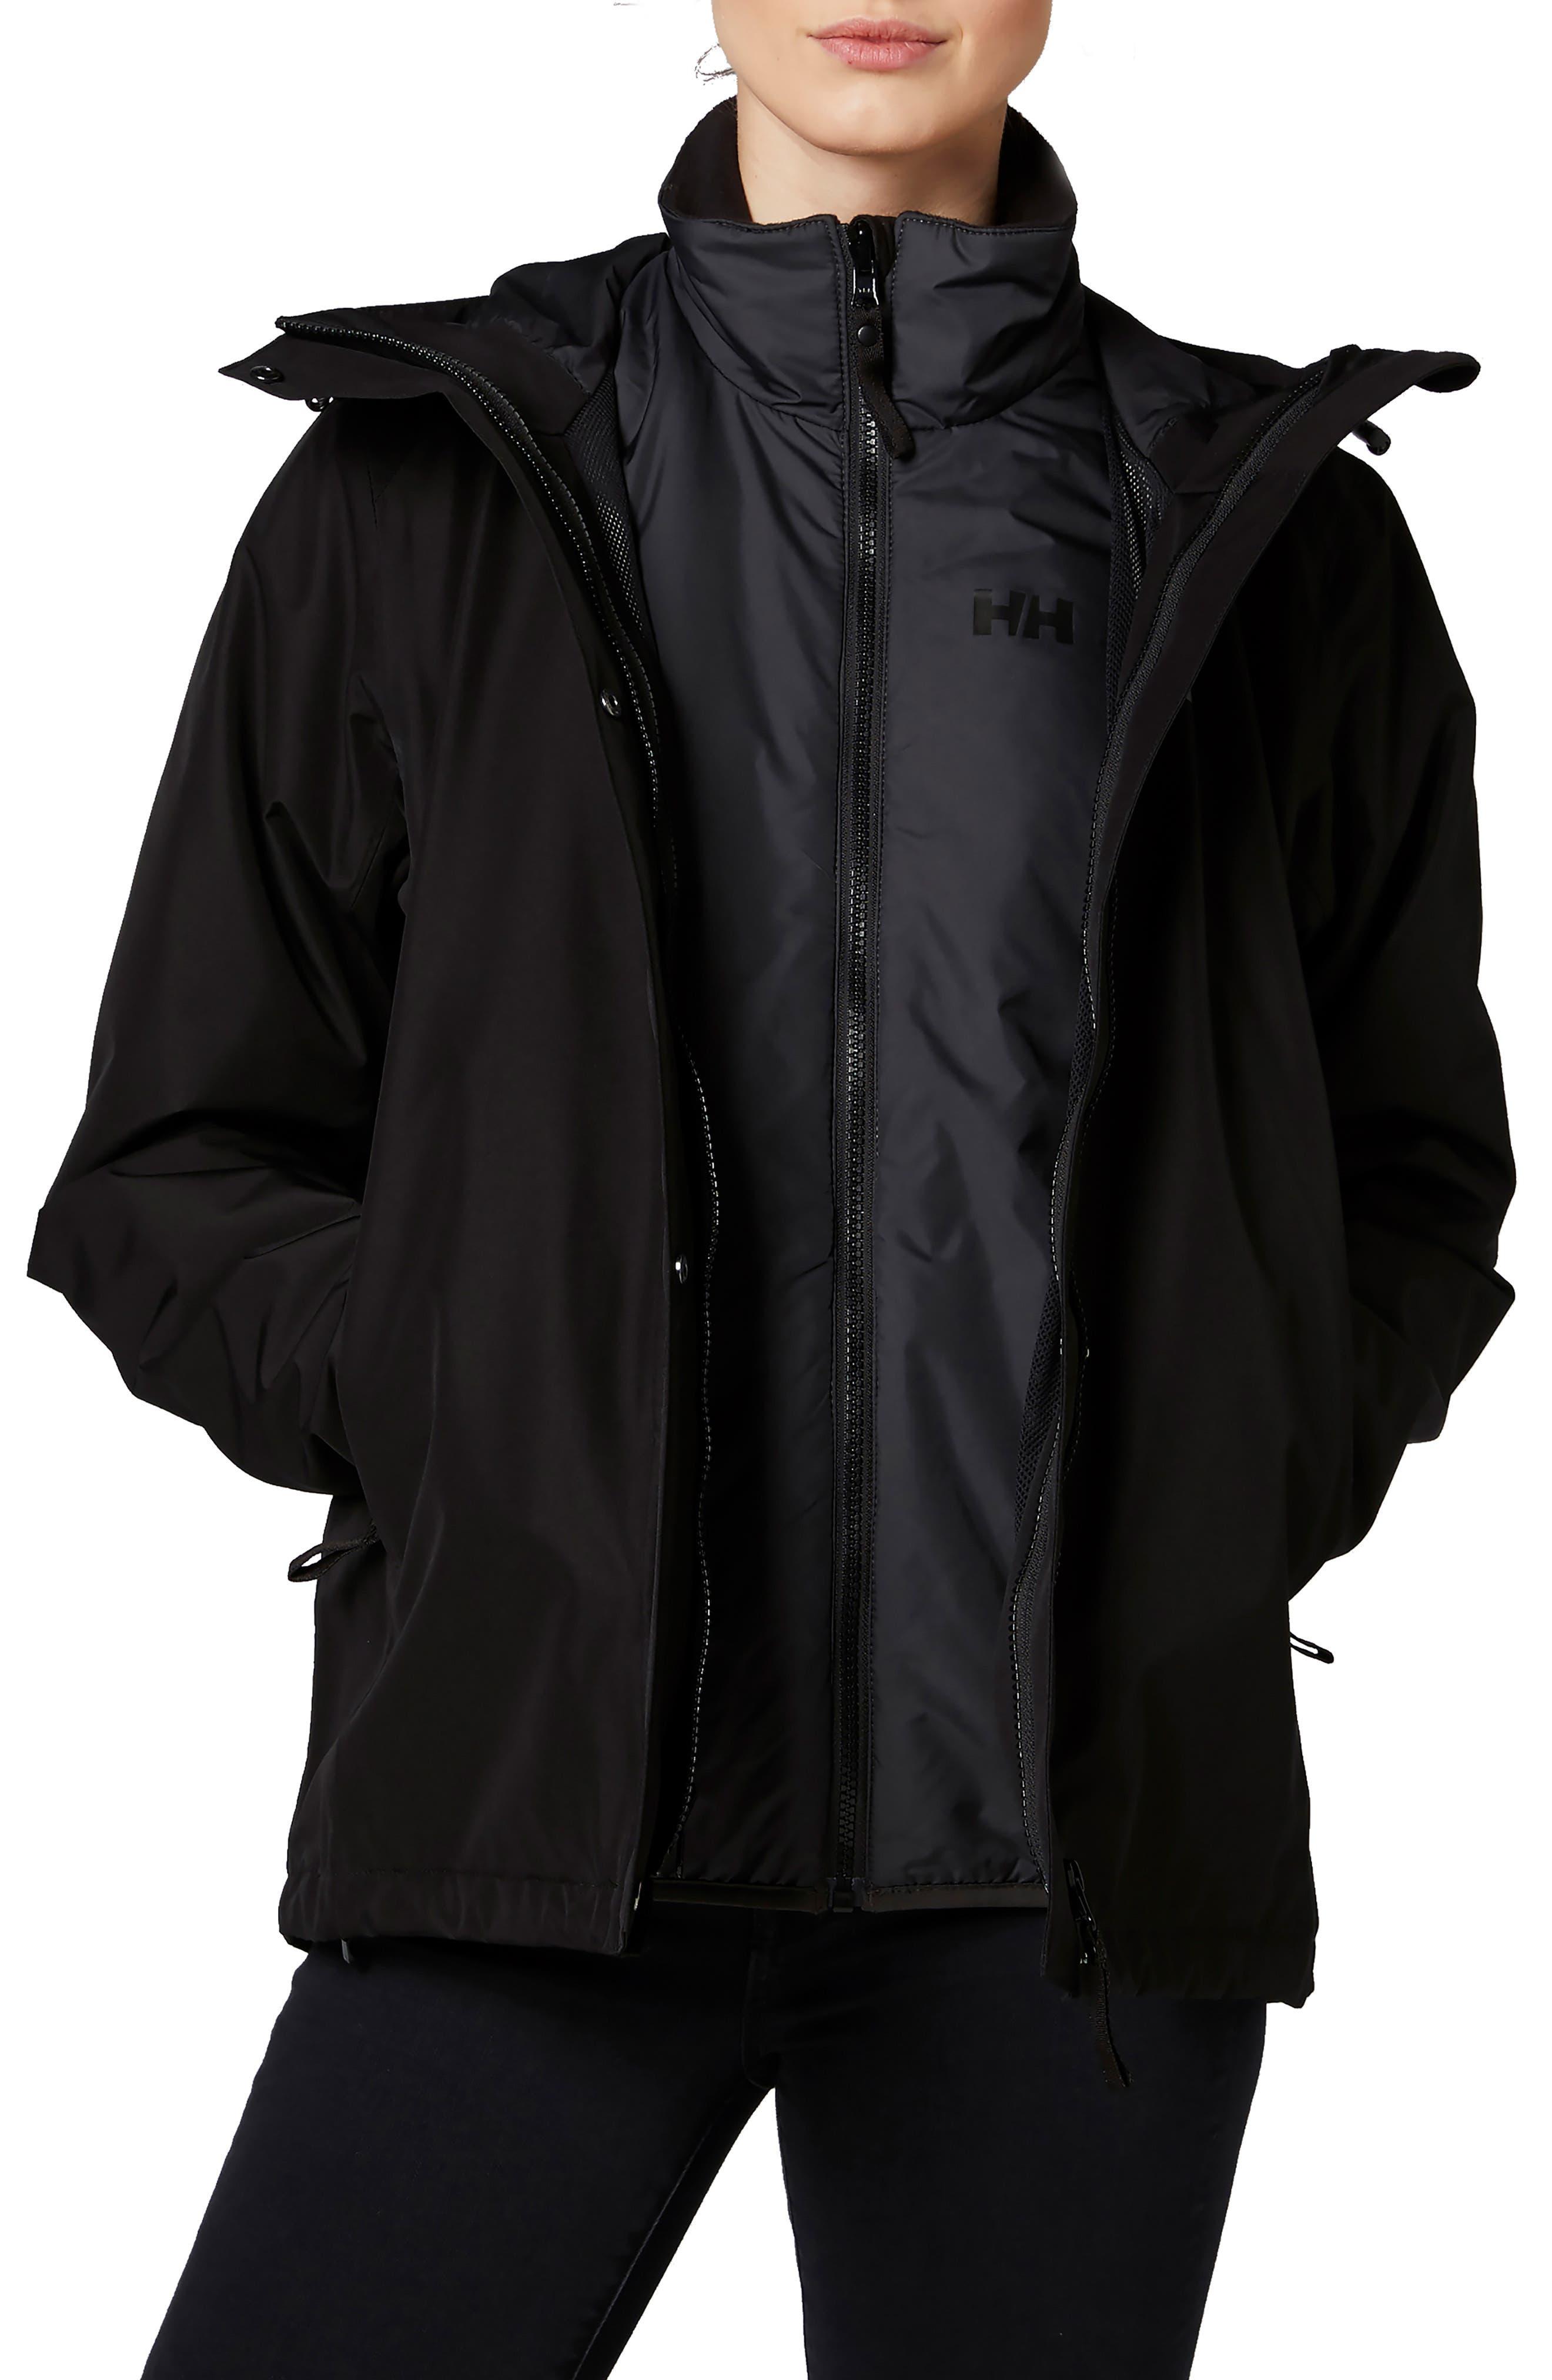 HELLY HANSEN Squamish 3-In1 Jacket in Black